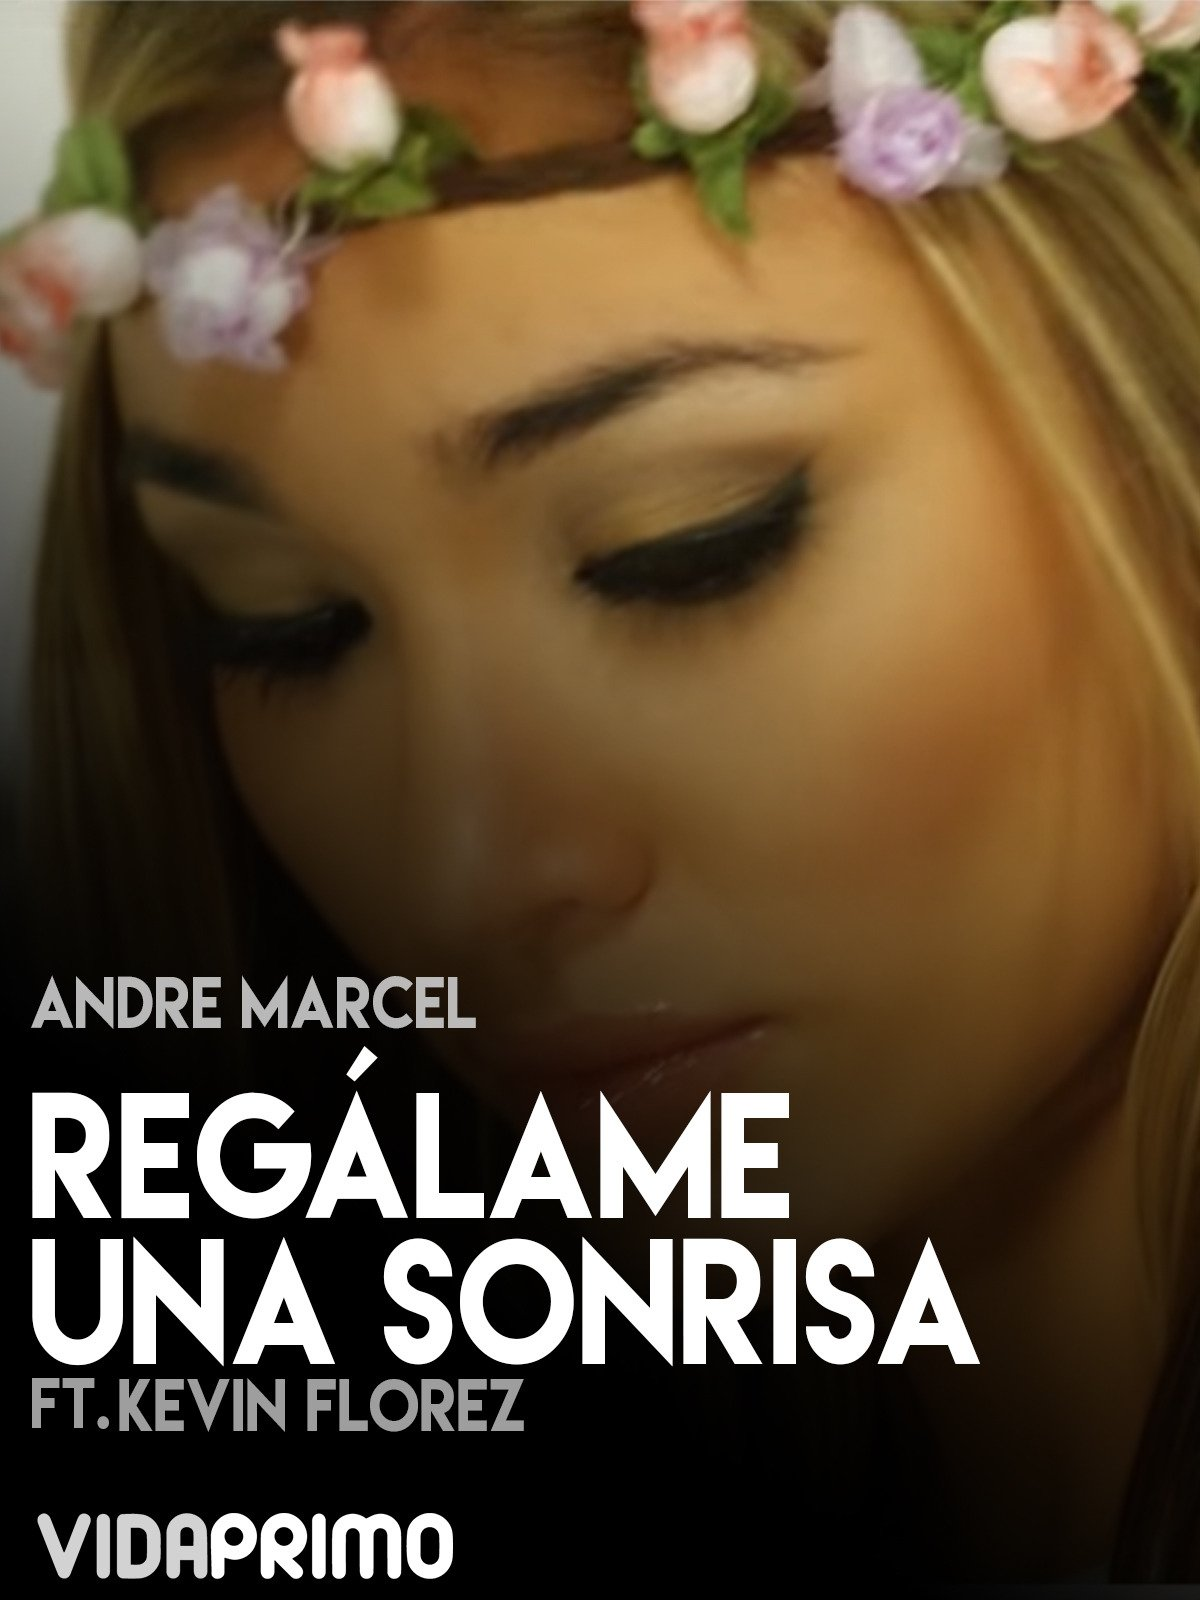 Amazon.com: Andre Marcel Ft. Kevin Florez - Regálame una sonrisa: Andre Marcel